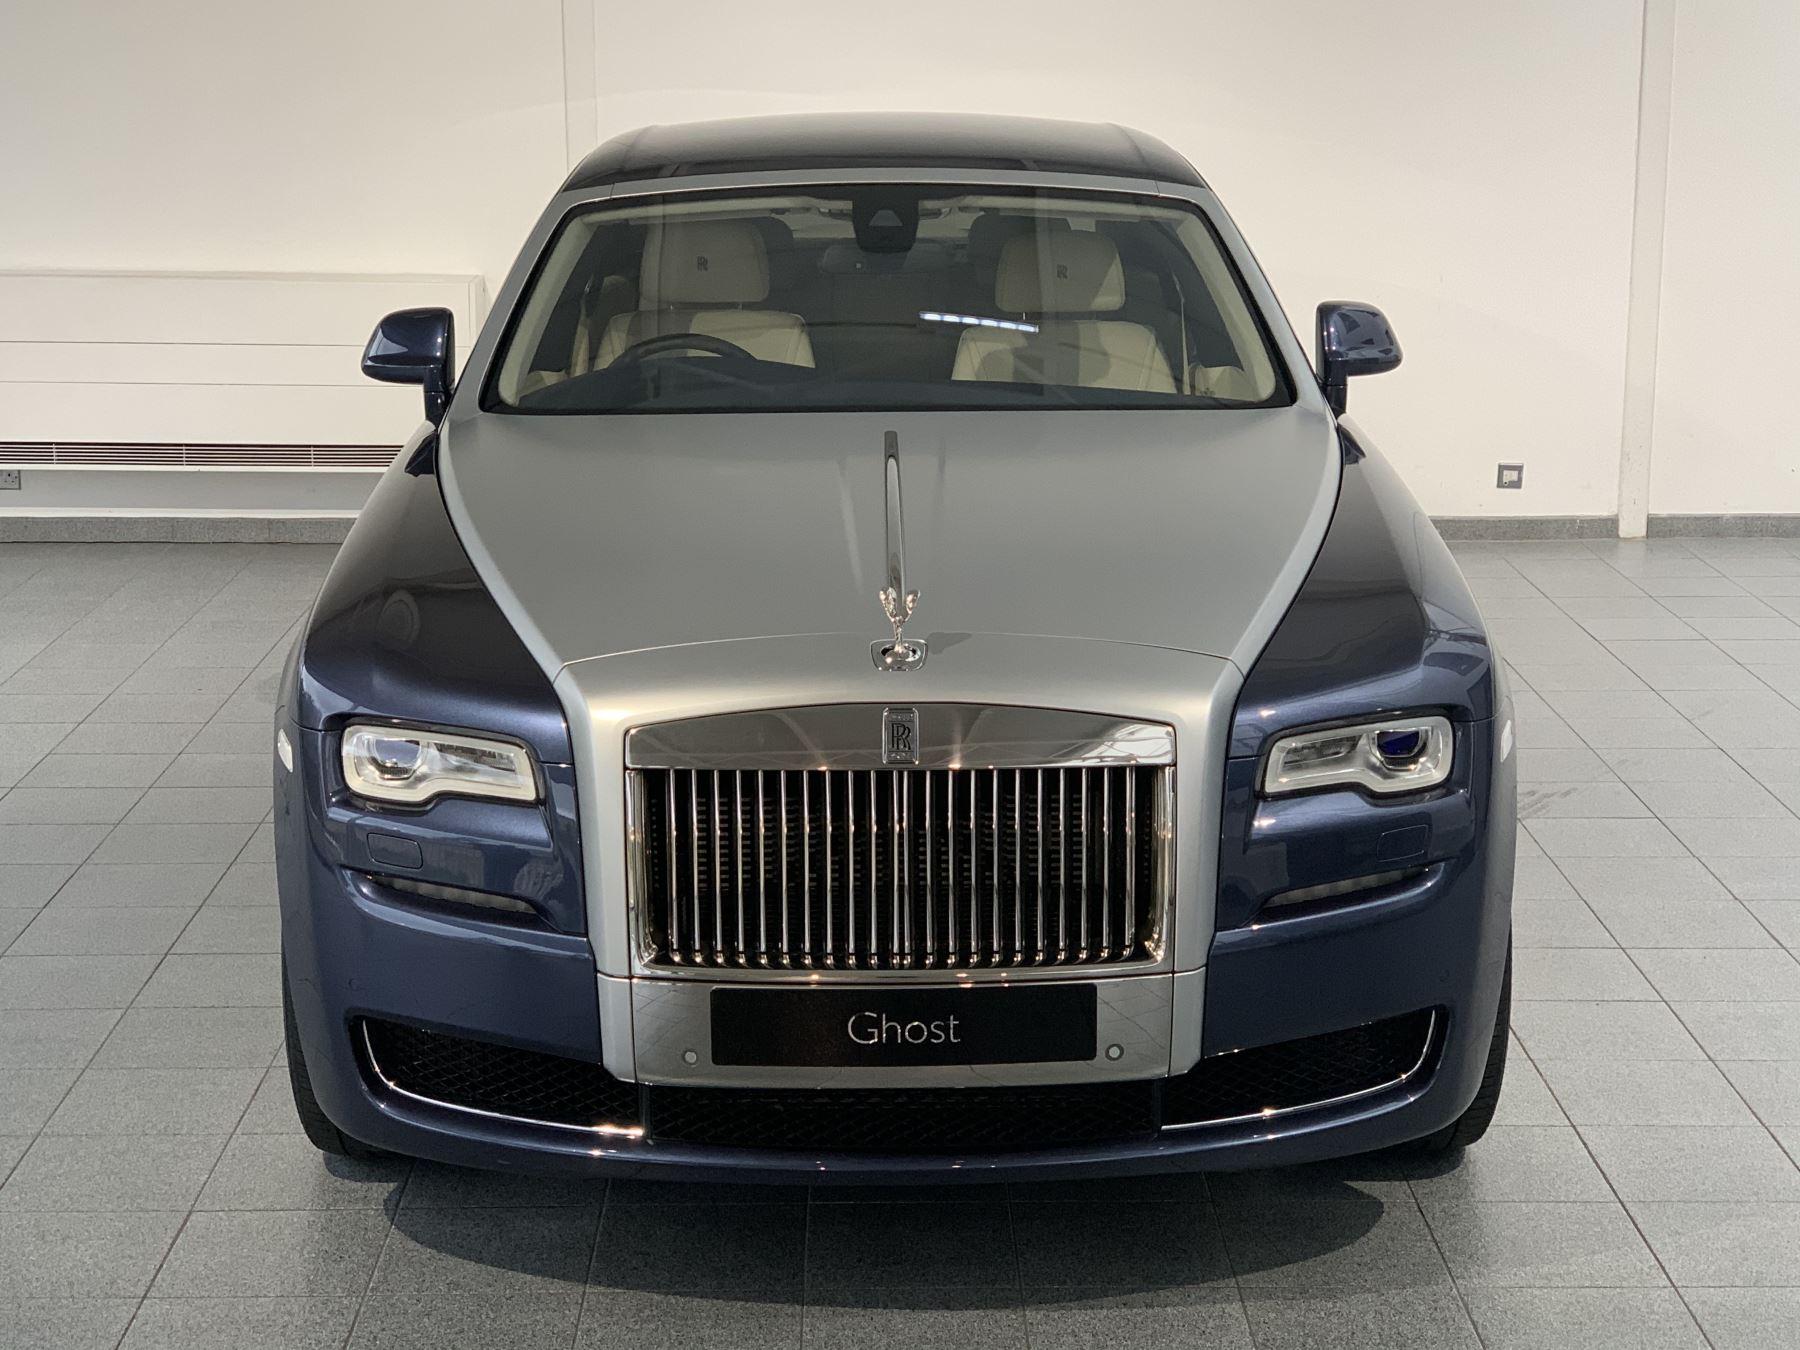 Rolls-Royce Ghost V12 AUTO image 7